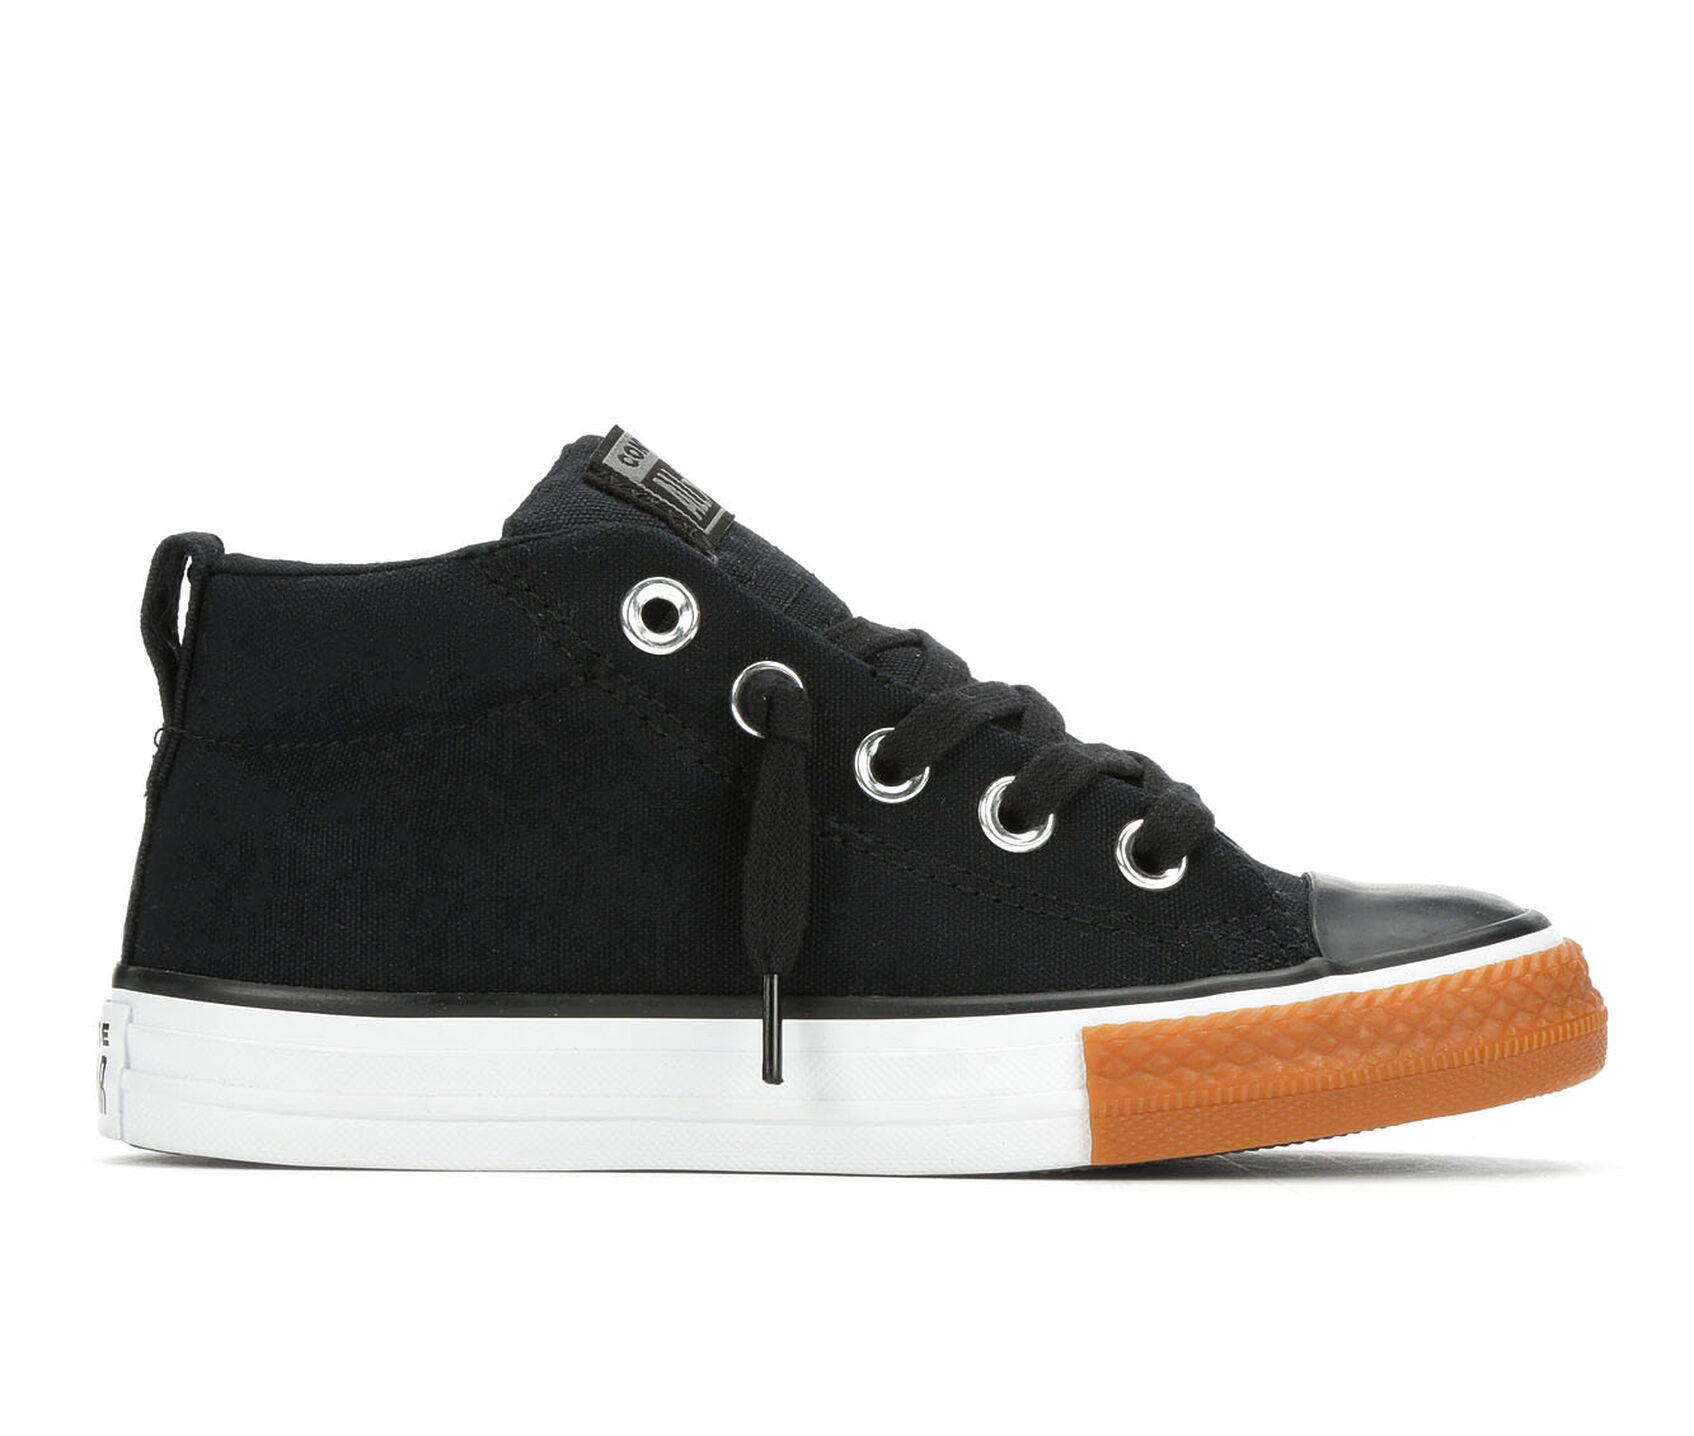 49d303c1d57a Boys  Converse Little Kid   Big Kid CTAS Street Mid Gum Sneakers ...